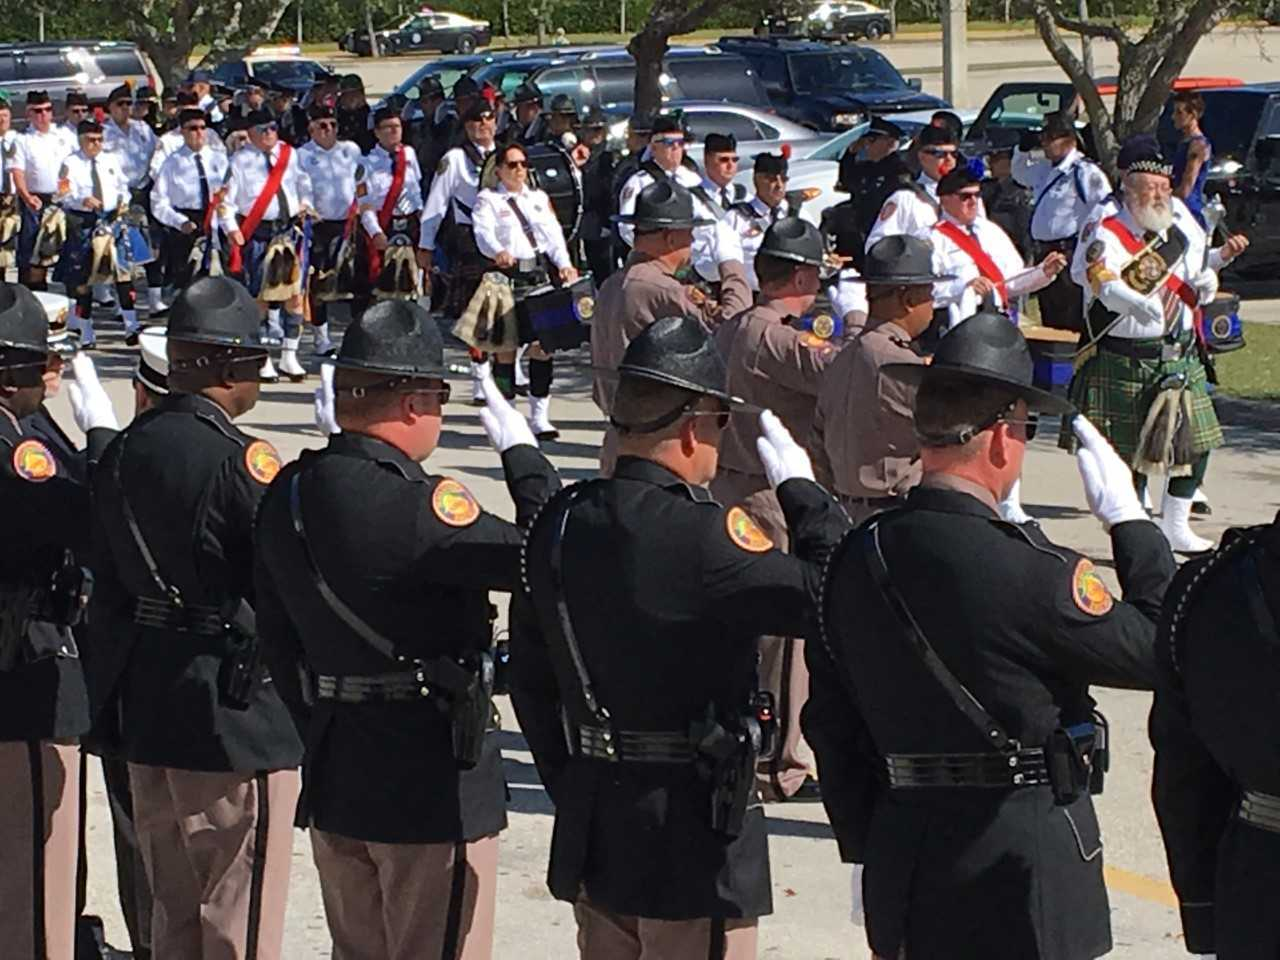 Hinton procession arrival 4.jpg